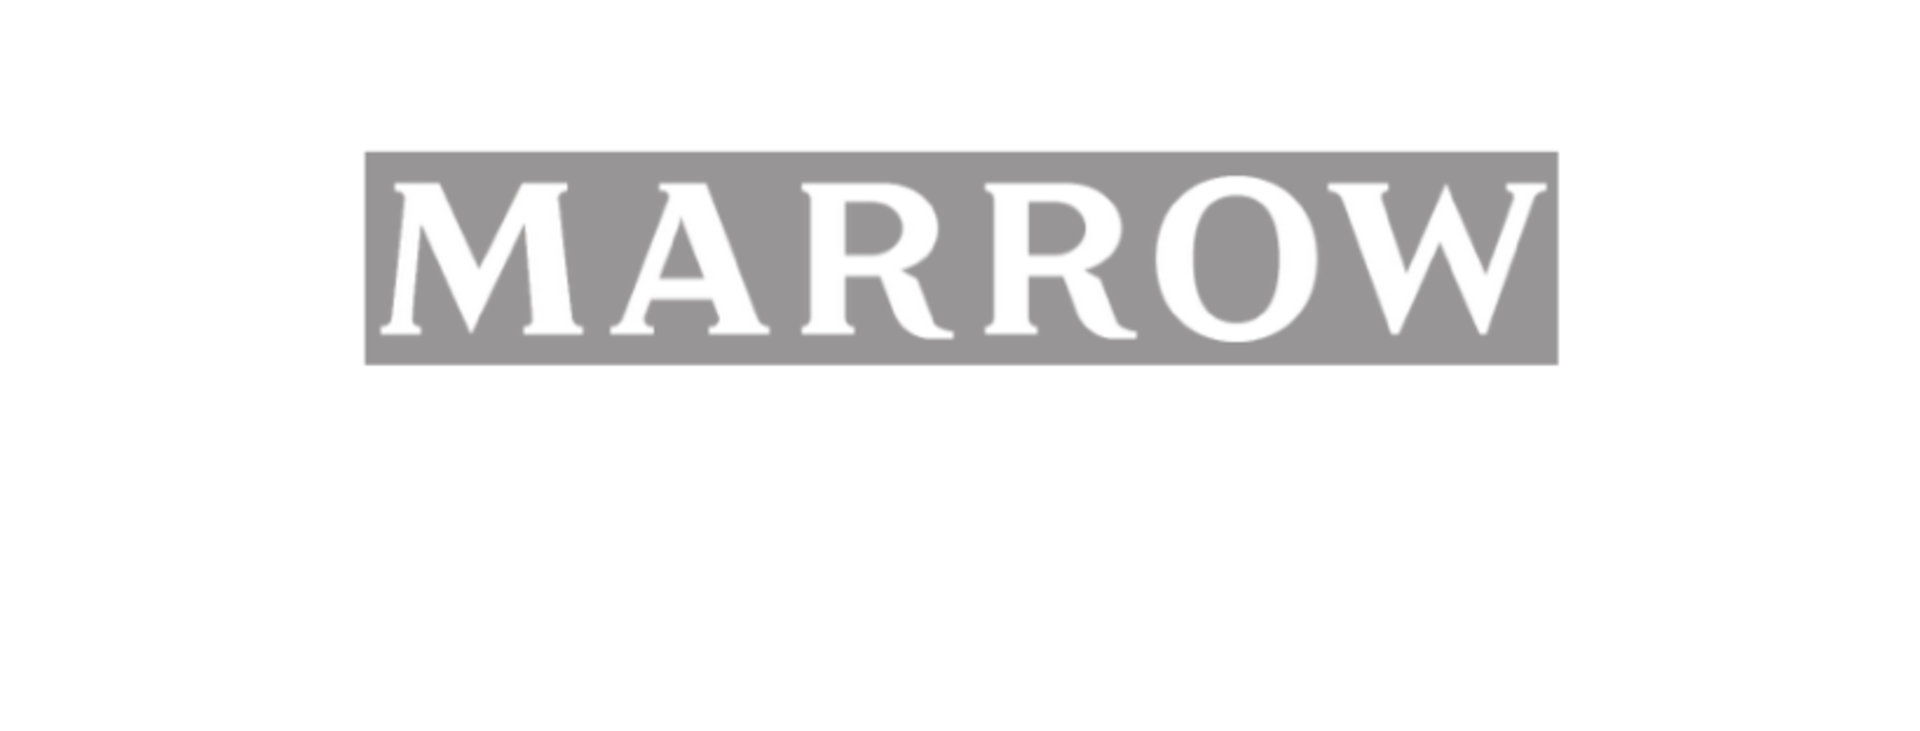 Client Spotlight: MARROW DETROIT